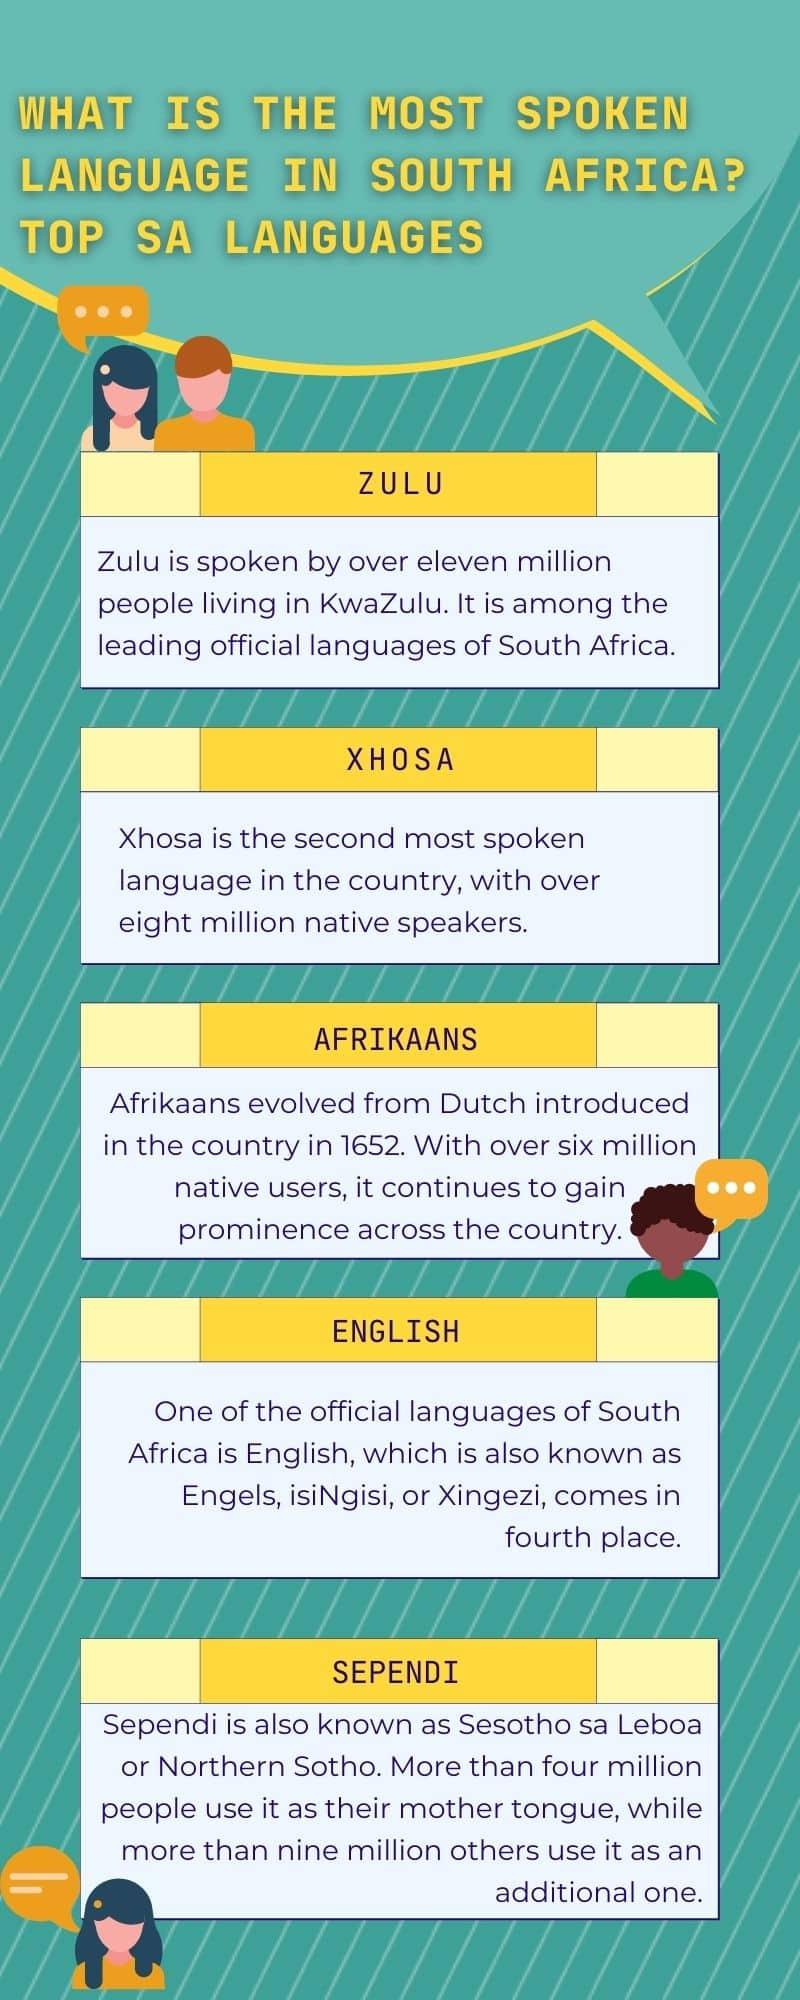 Top 11 SA languages